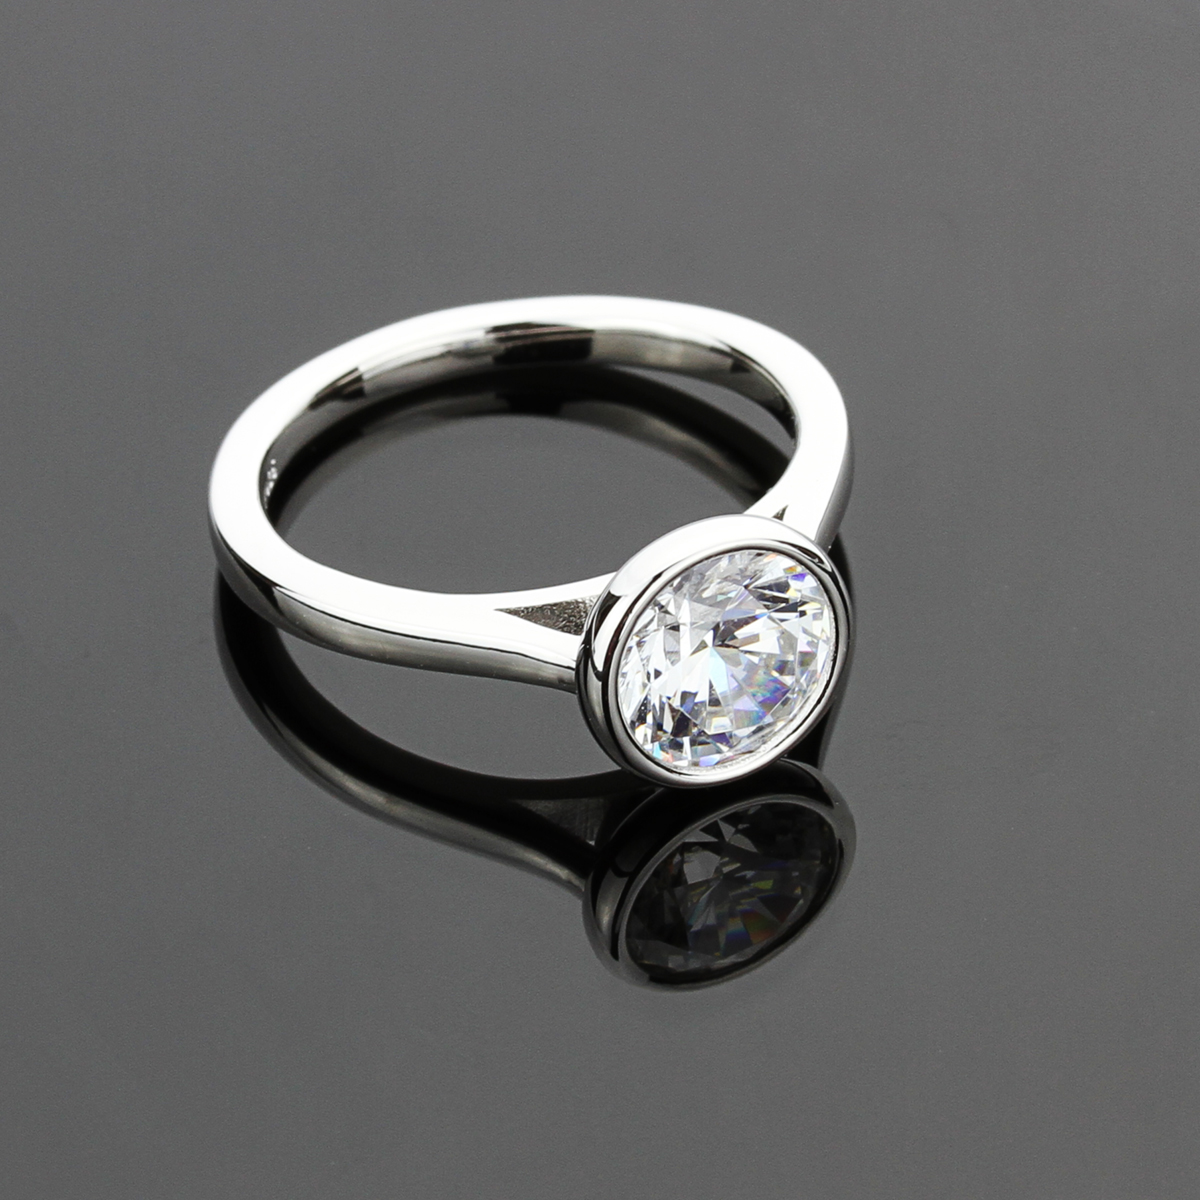 8mm platinum plated silver 2ct cz bezel solitaire wedding